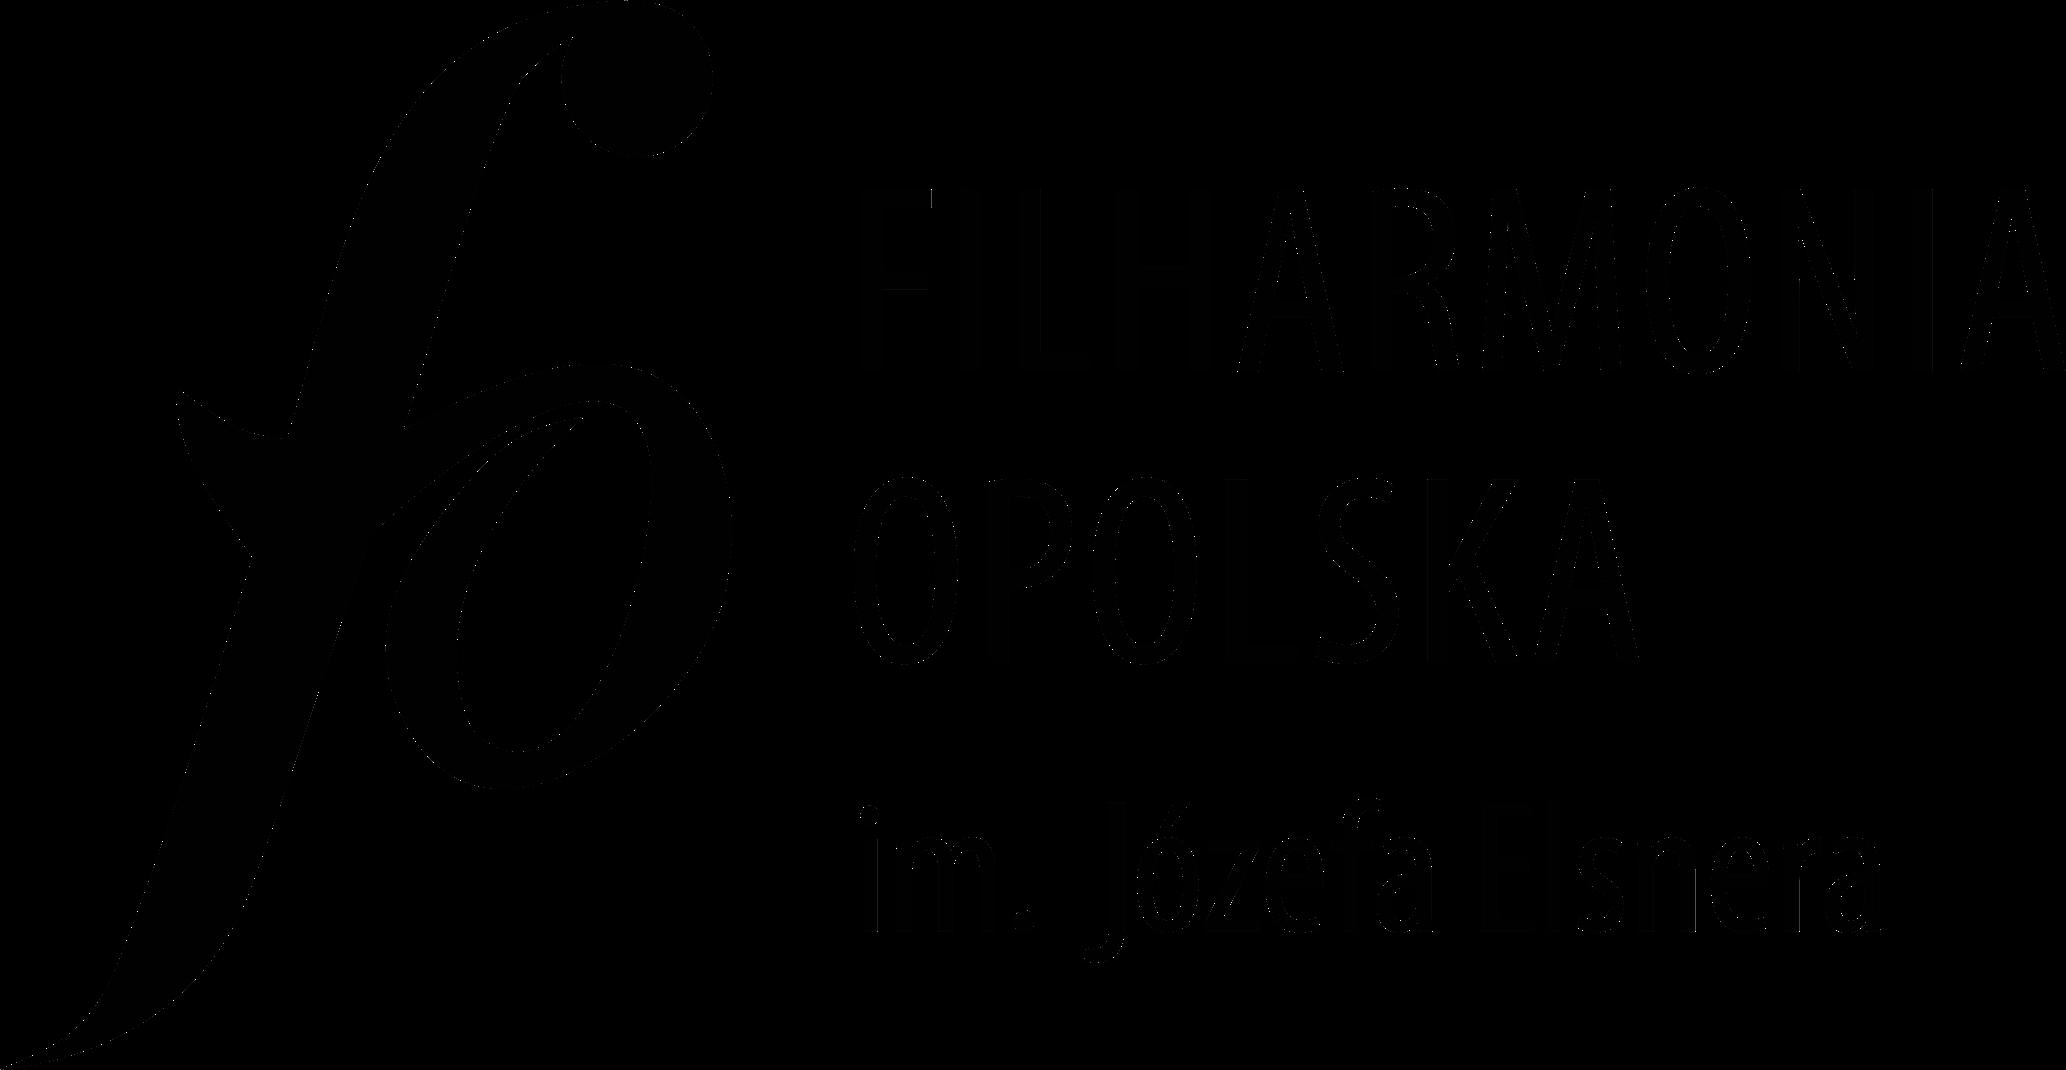 Filharmonia Opolska Infolinia | telefon, e-mail, faks, adres, kontakt